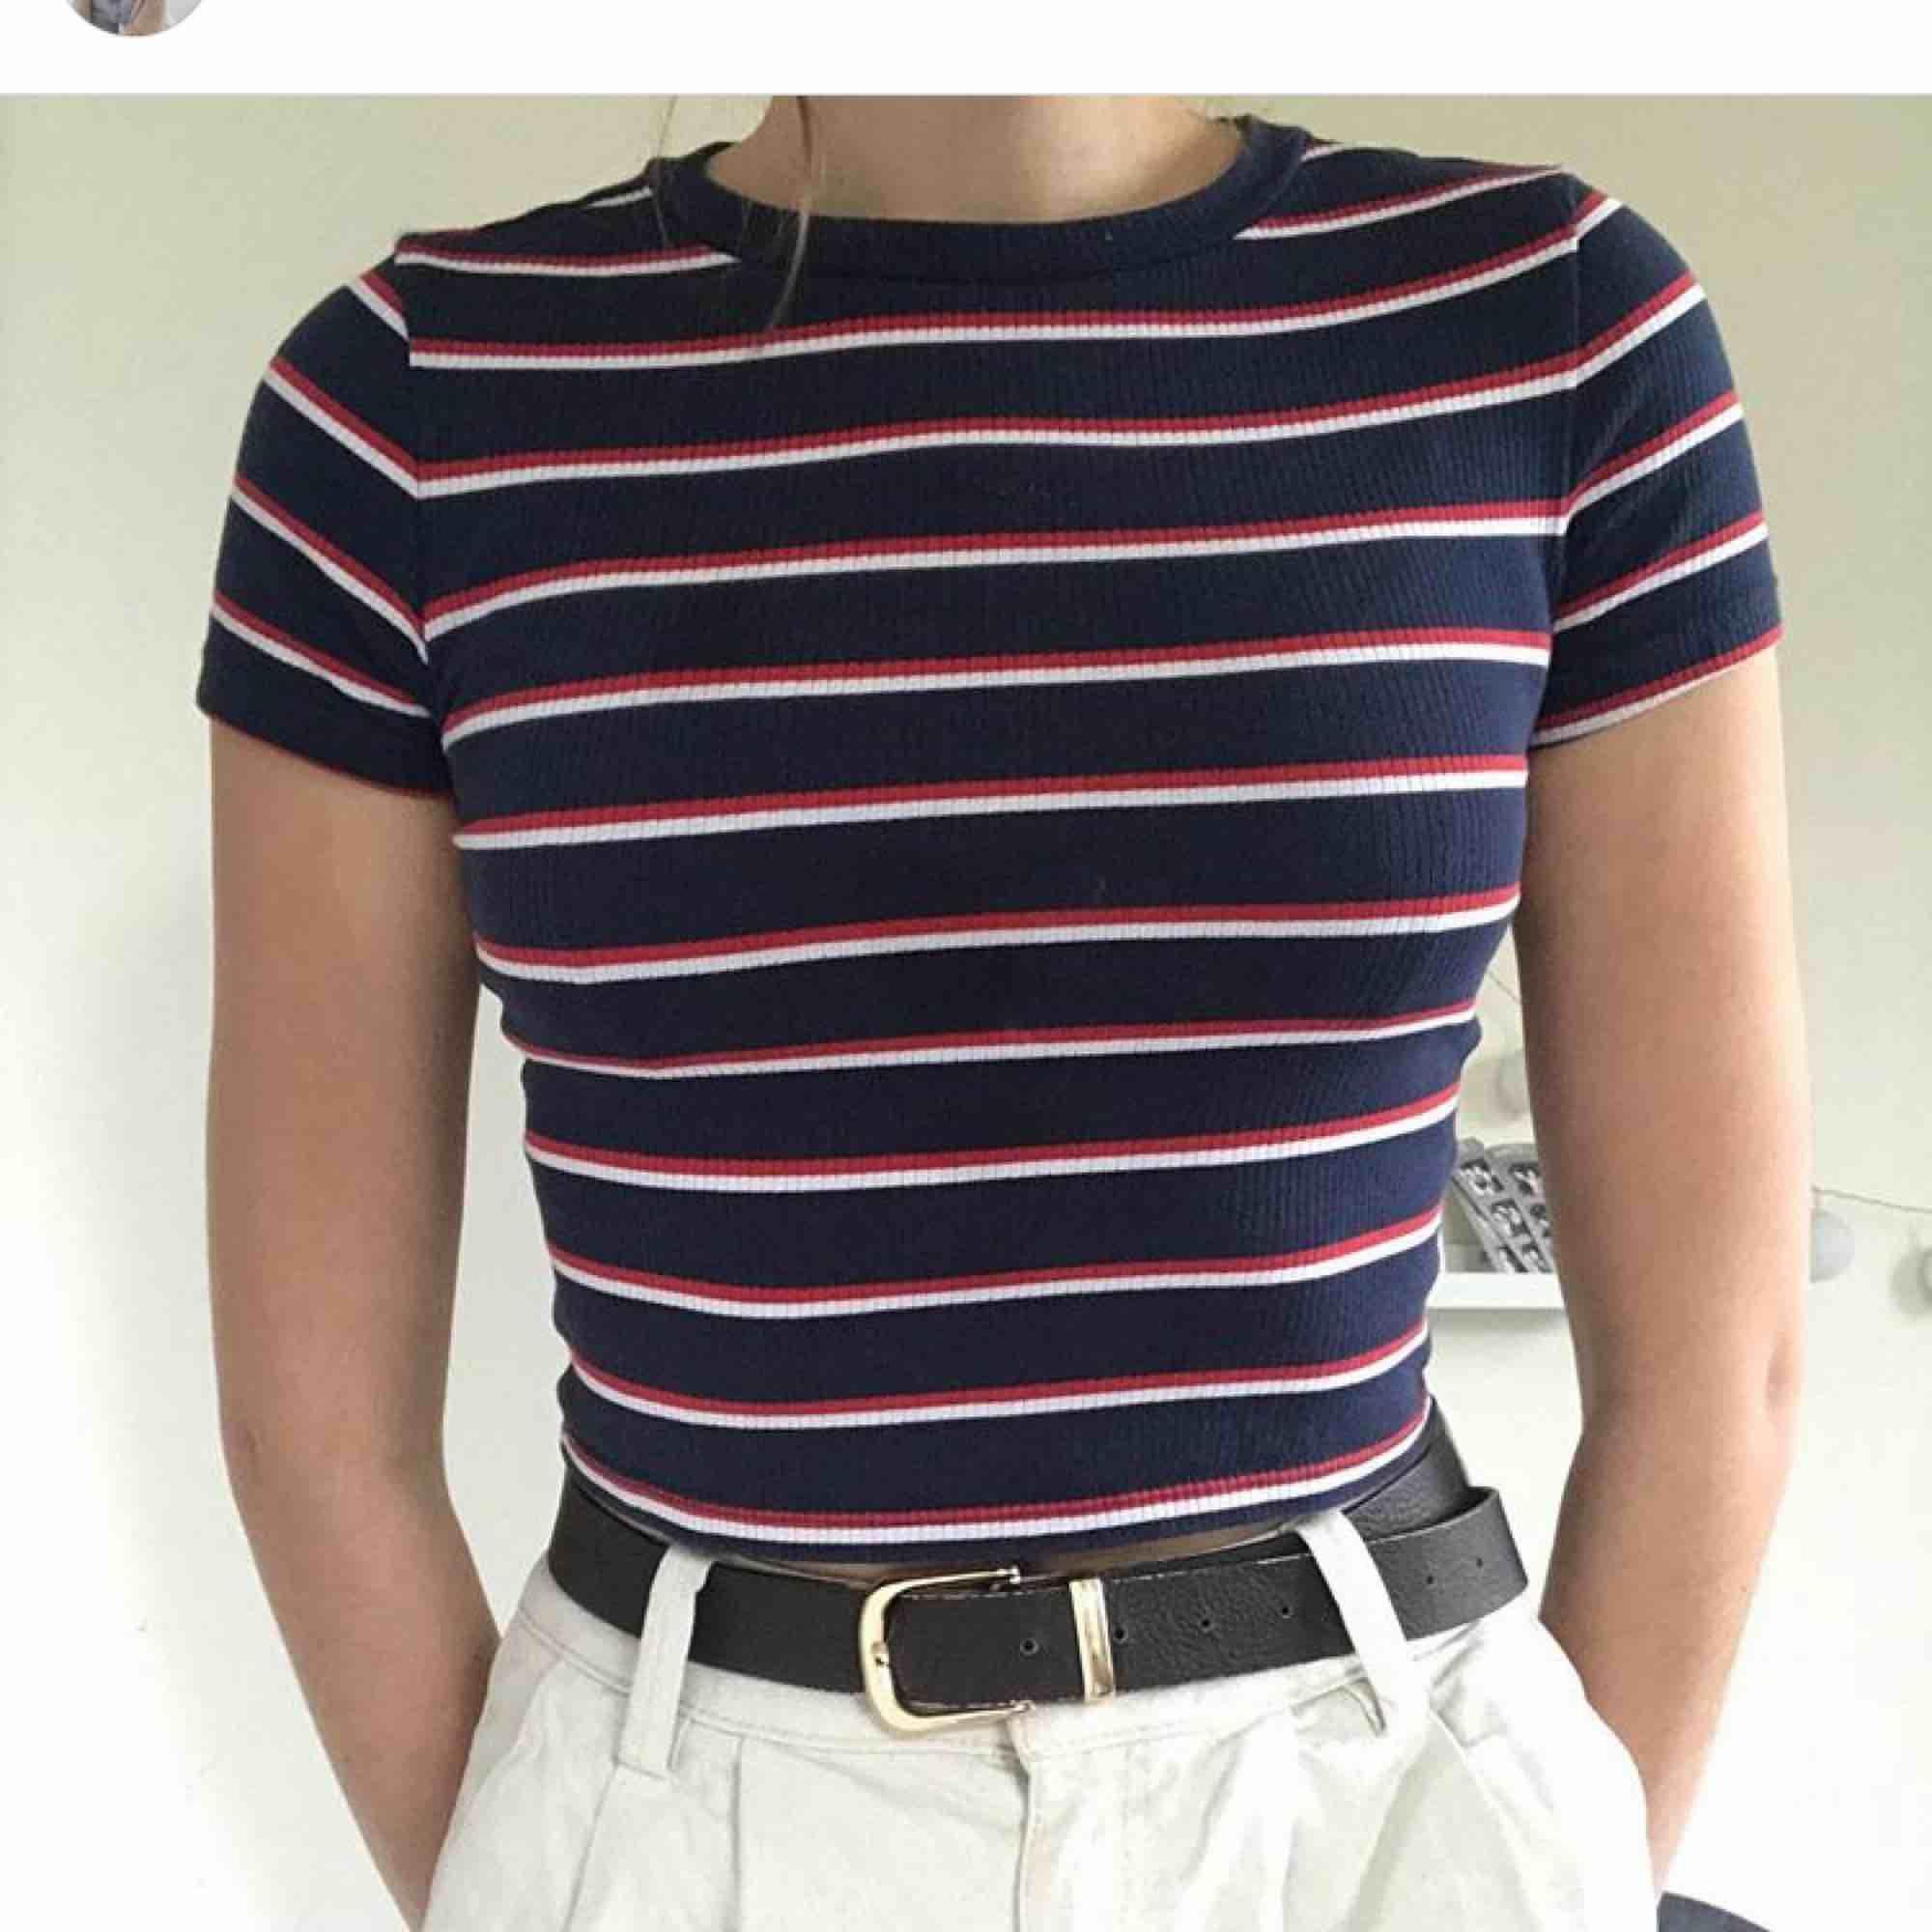 Asnice t-shirt från H&M! Storlek S, 25 kr!!. T-shirts.